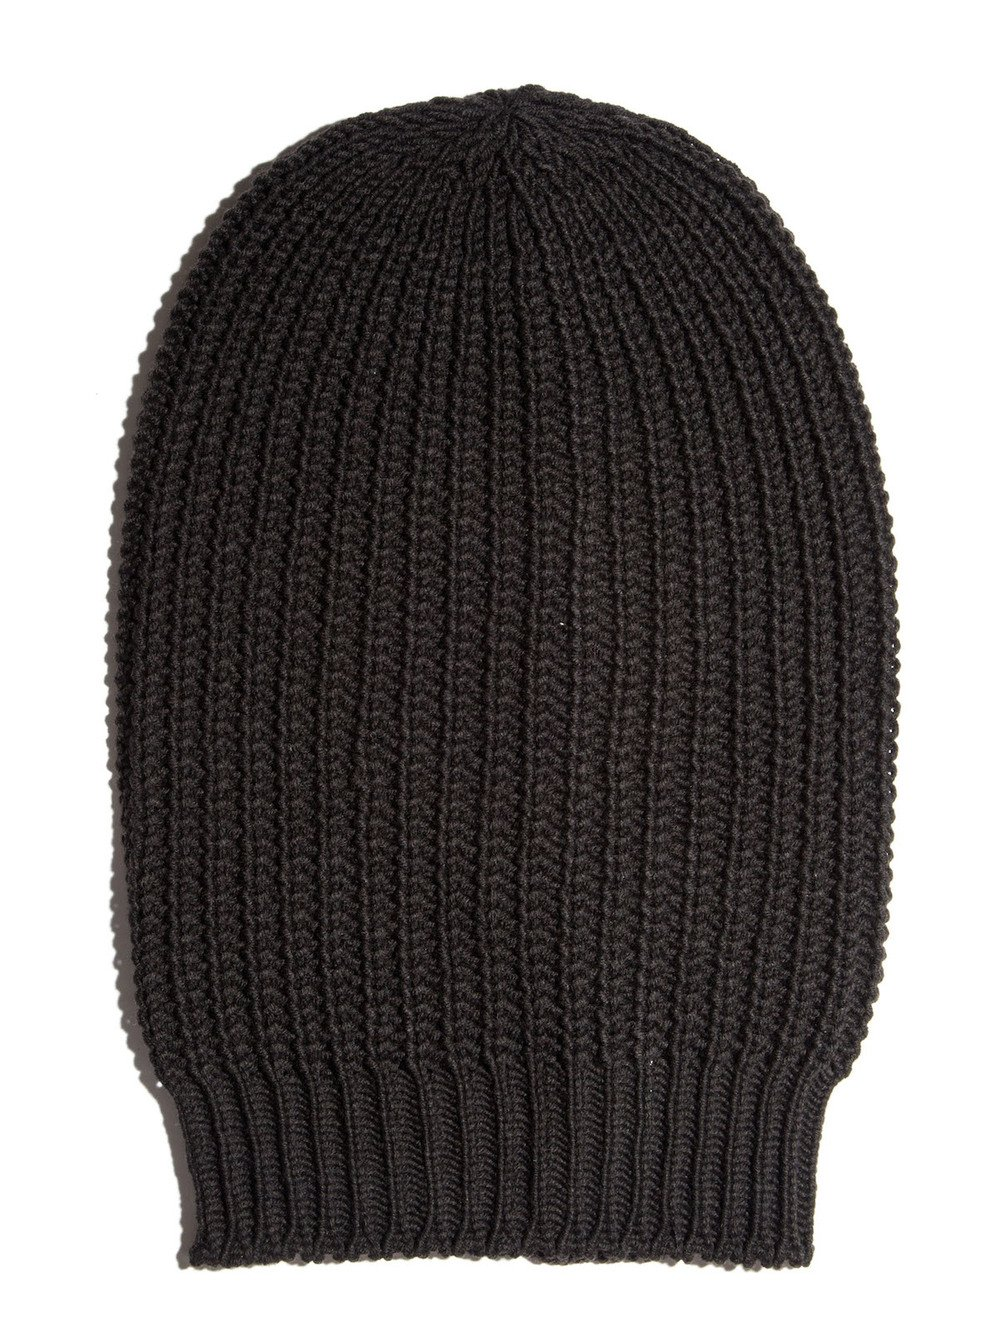 rick owens black wool beanie